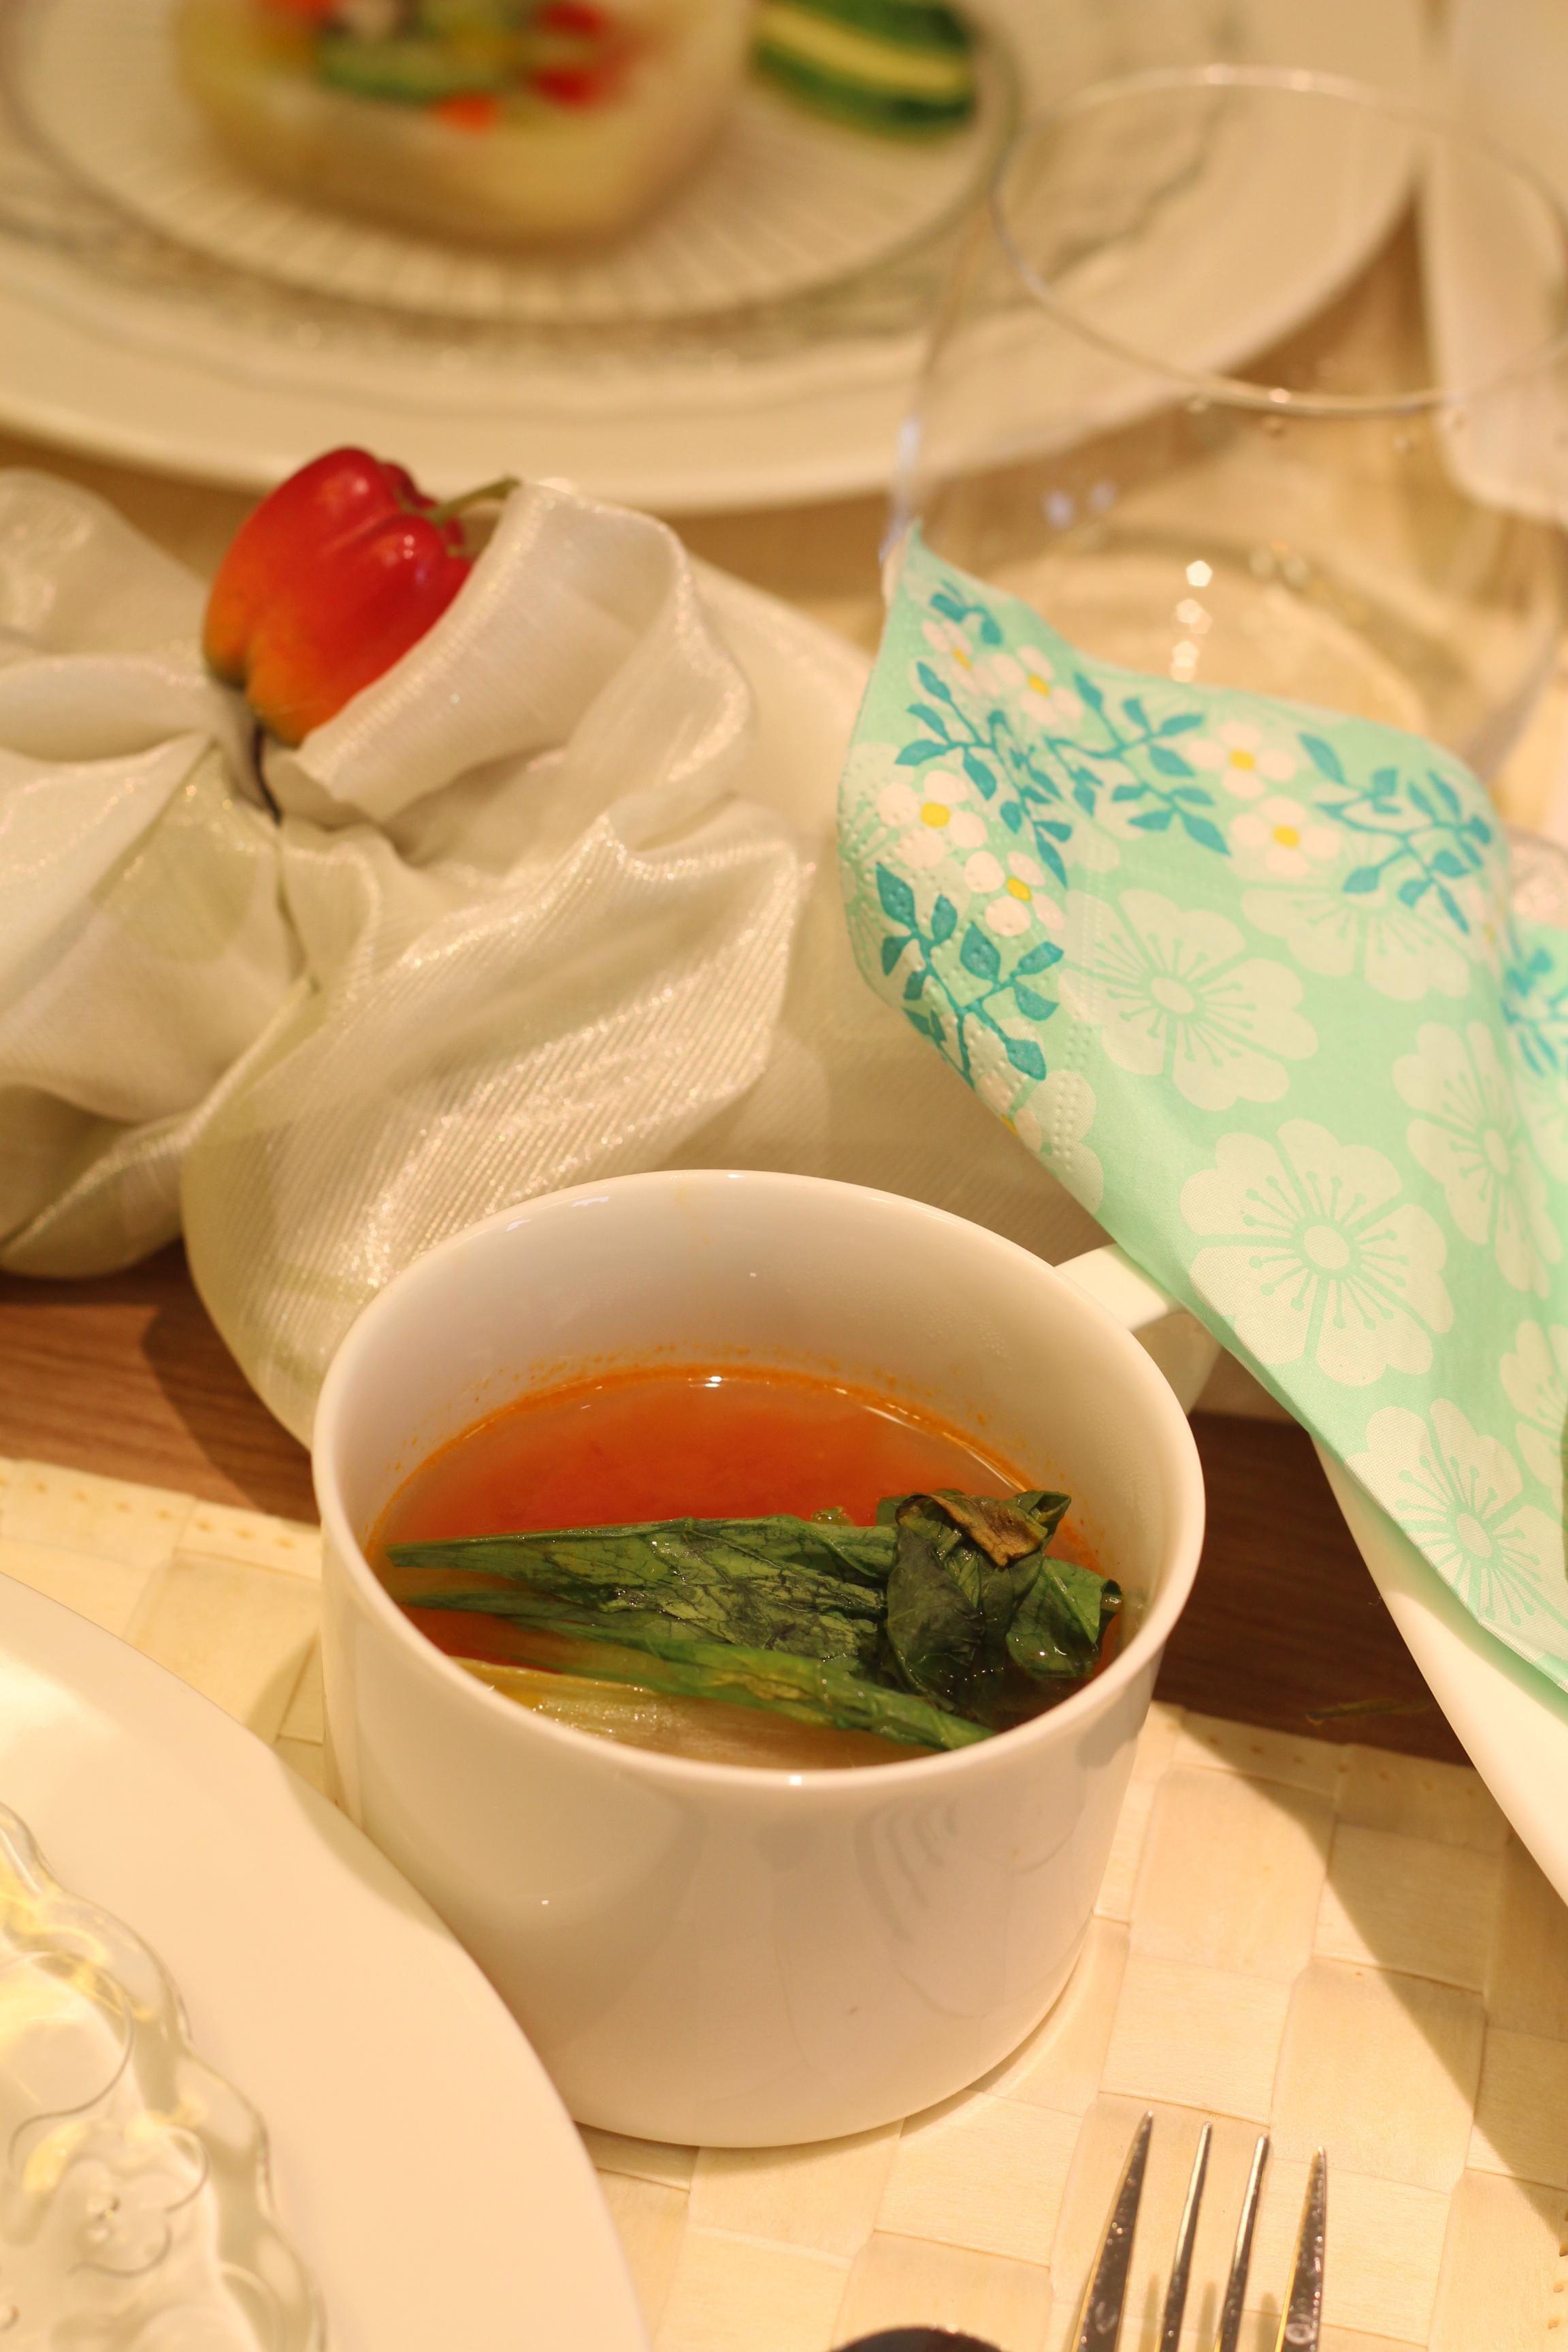 a-ta-sante ~la class de pain~ 糖質制限パン・料理教室『低糖質料理でおもてなし』inクリナップ大阪